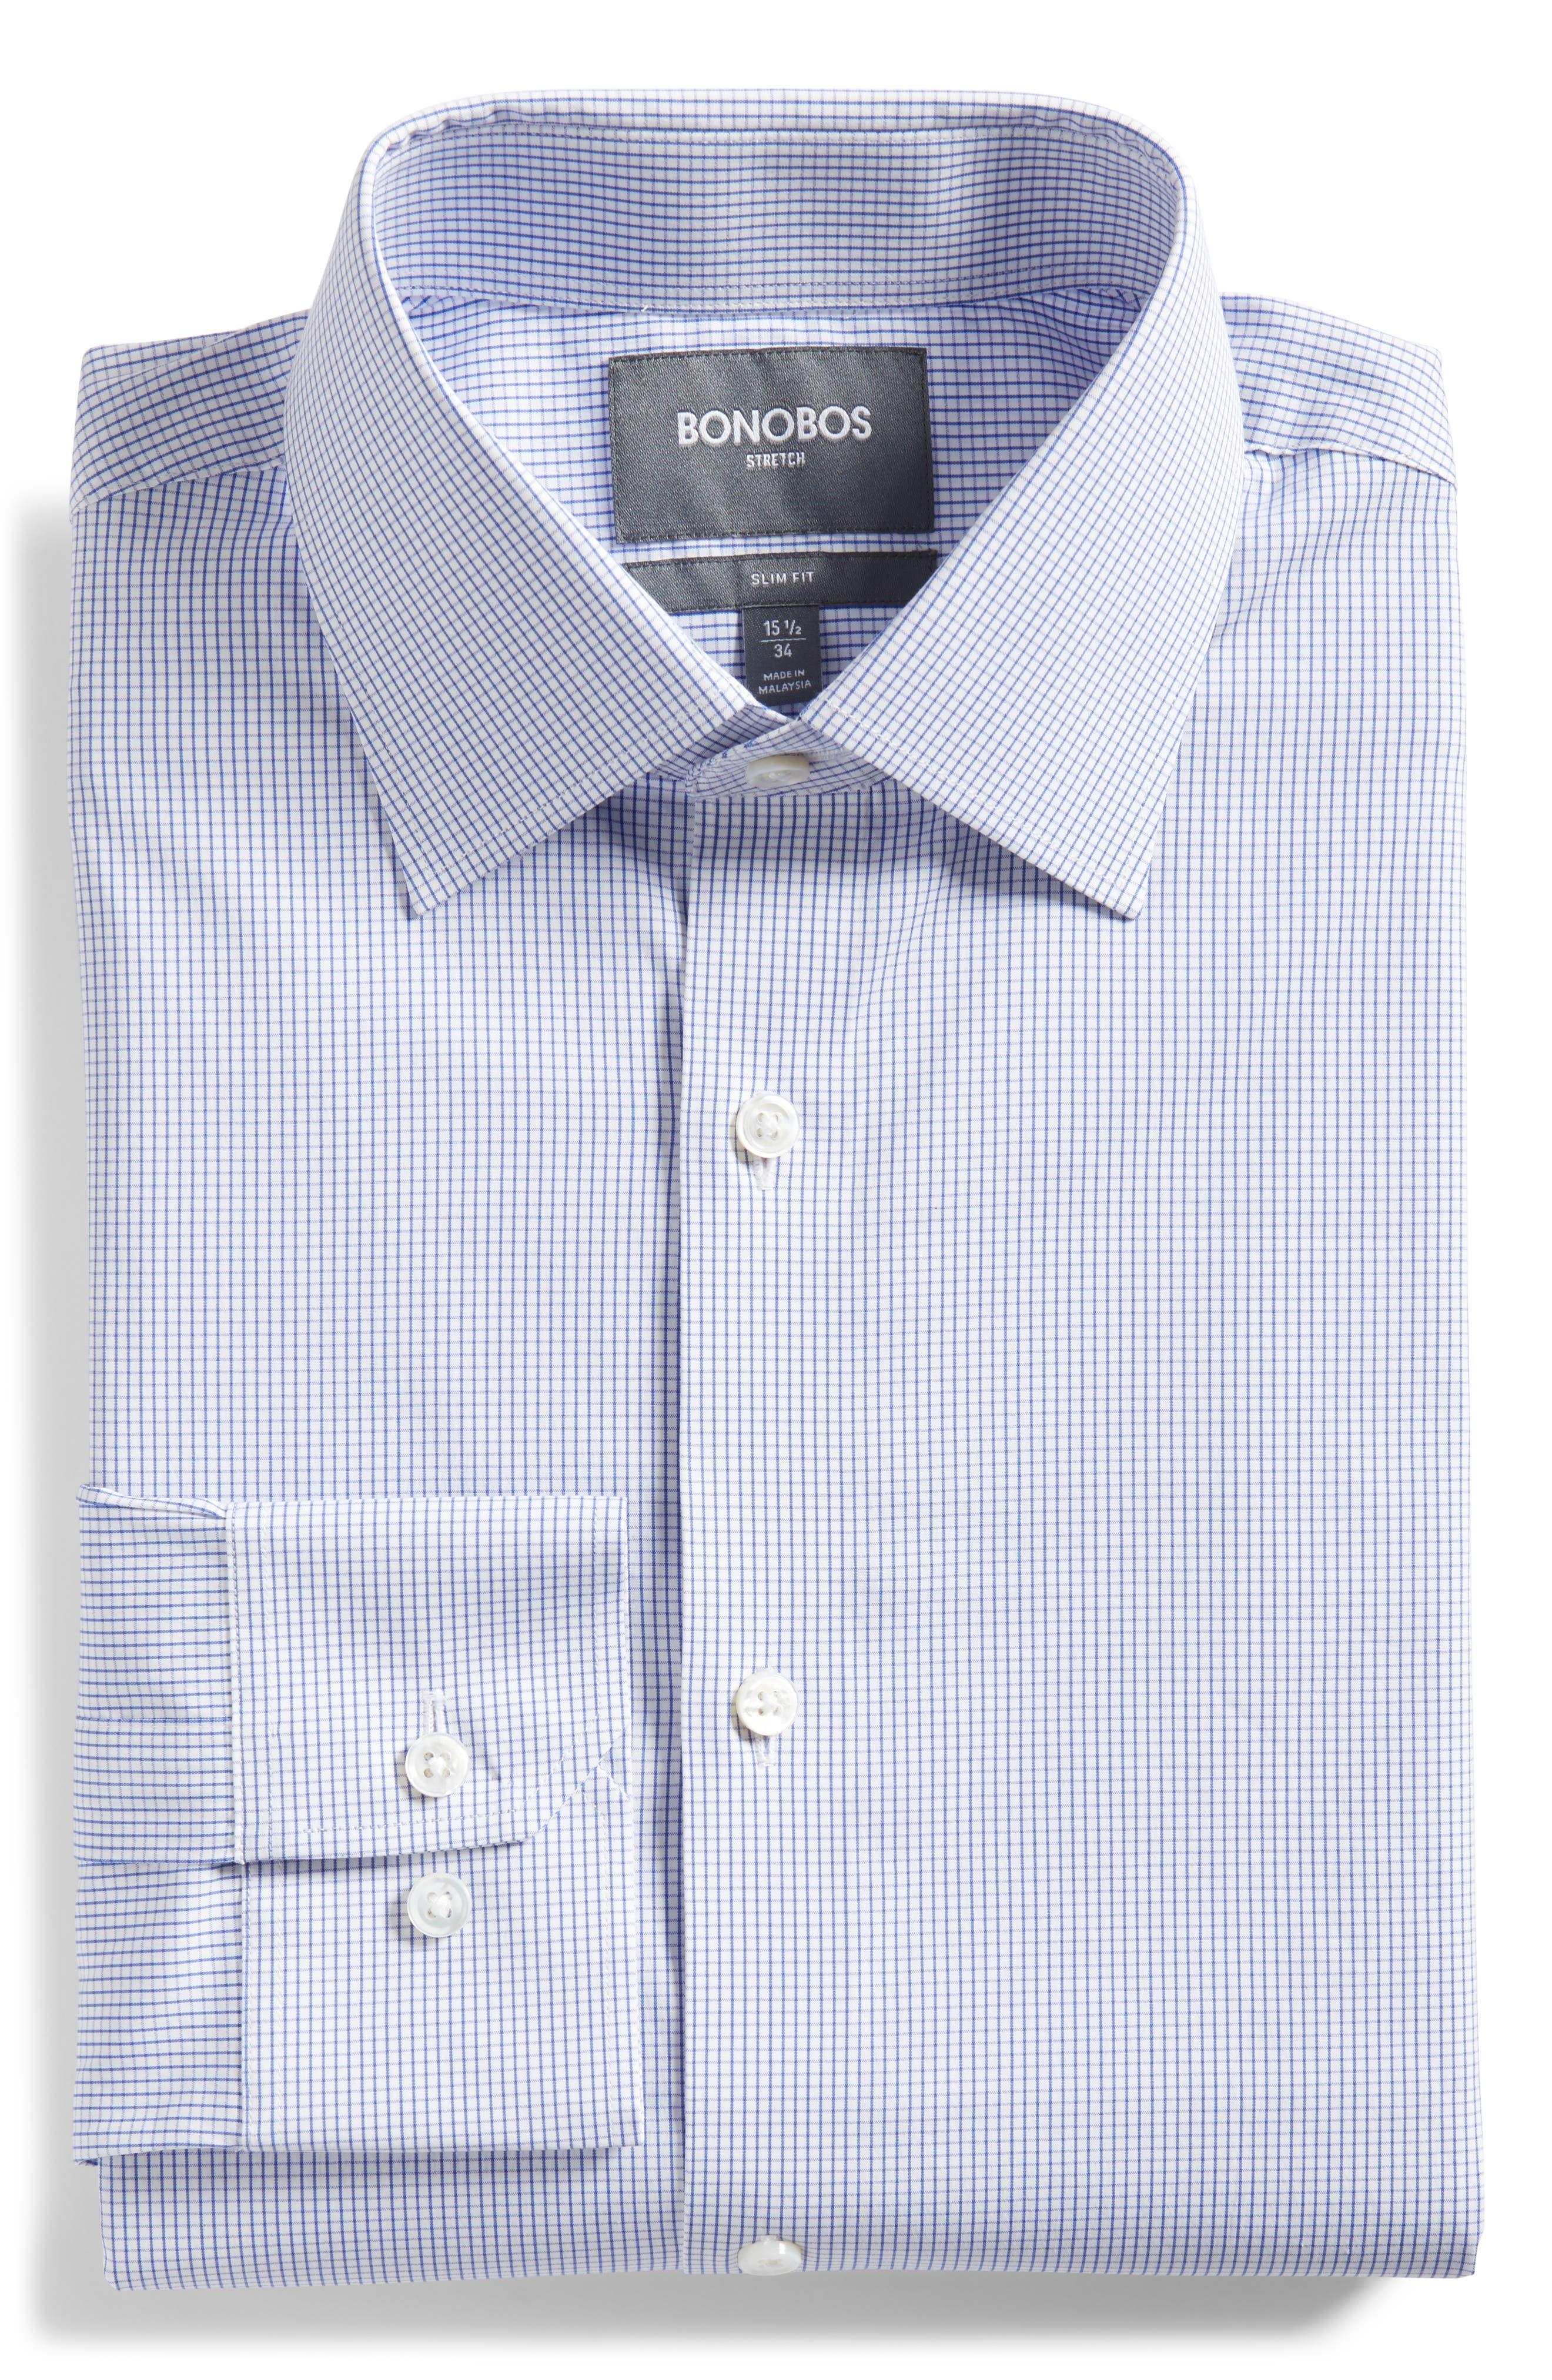 Jetsetter Slim Fit Stretch Check Dress Shirt,                             Alternate thumbnail 5, color,                             NAVY MINI CHECK